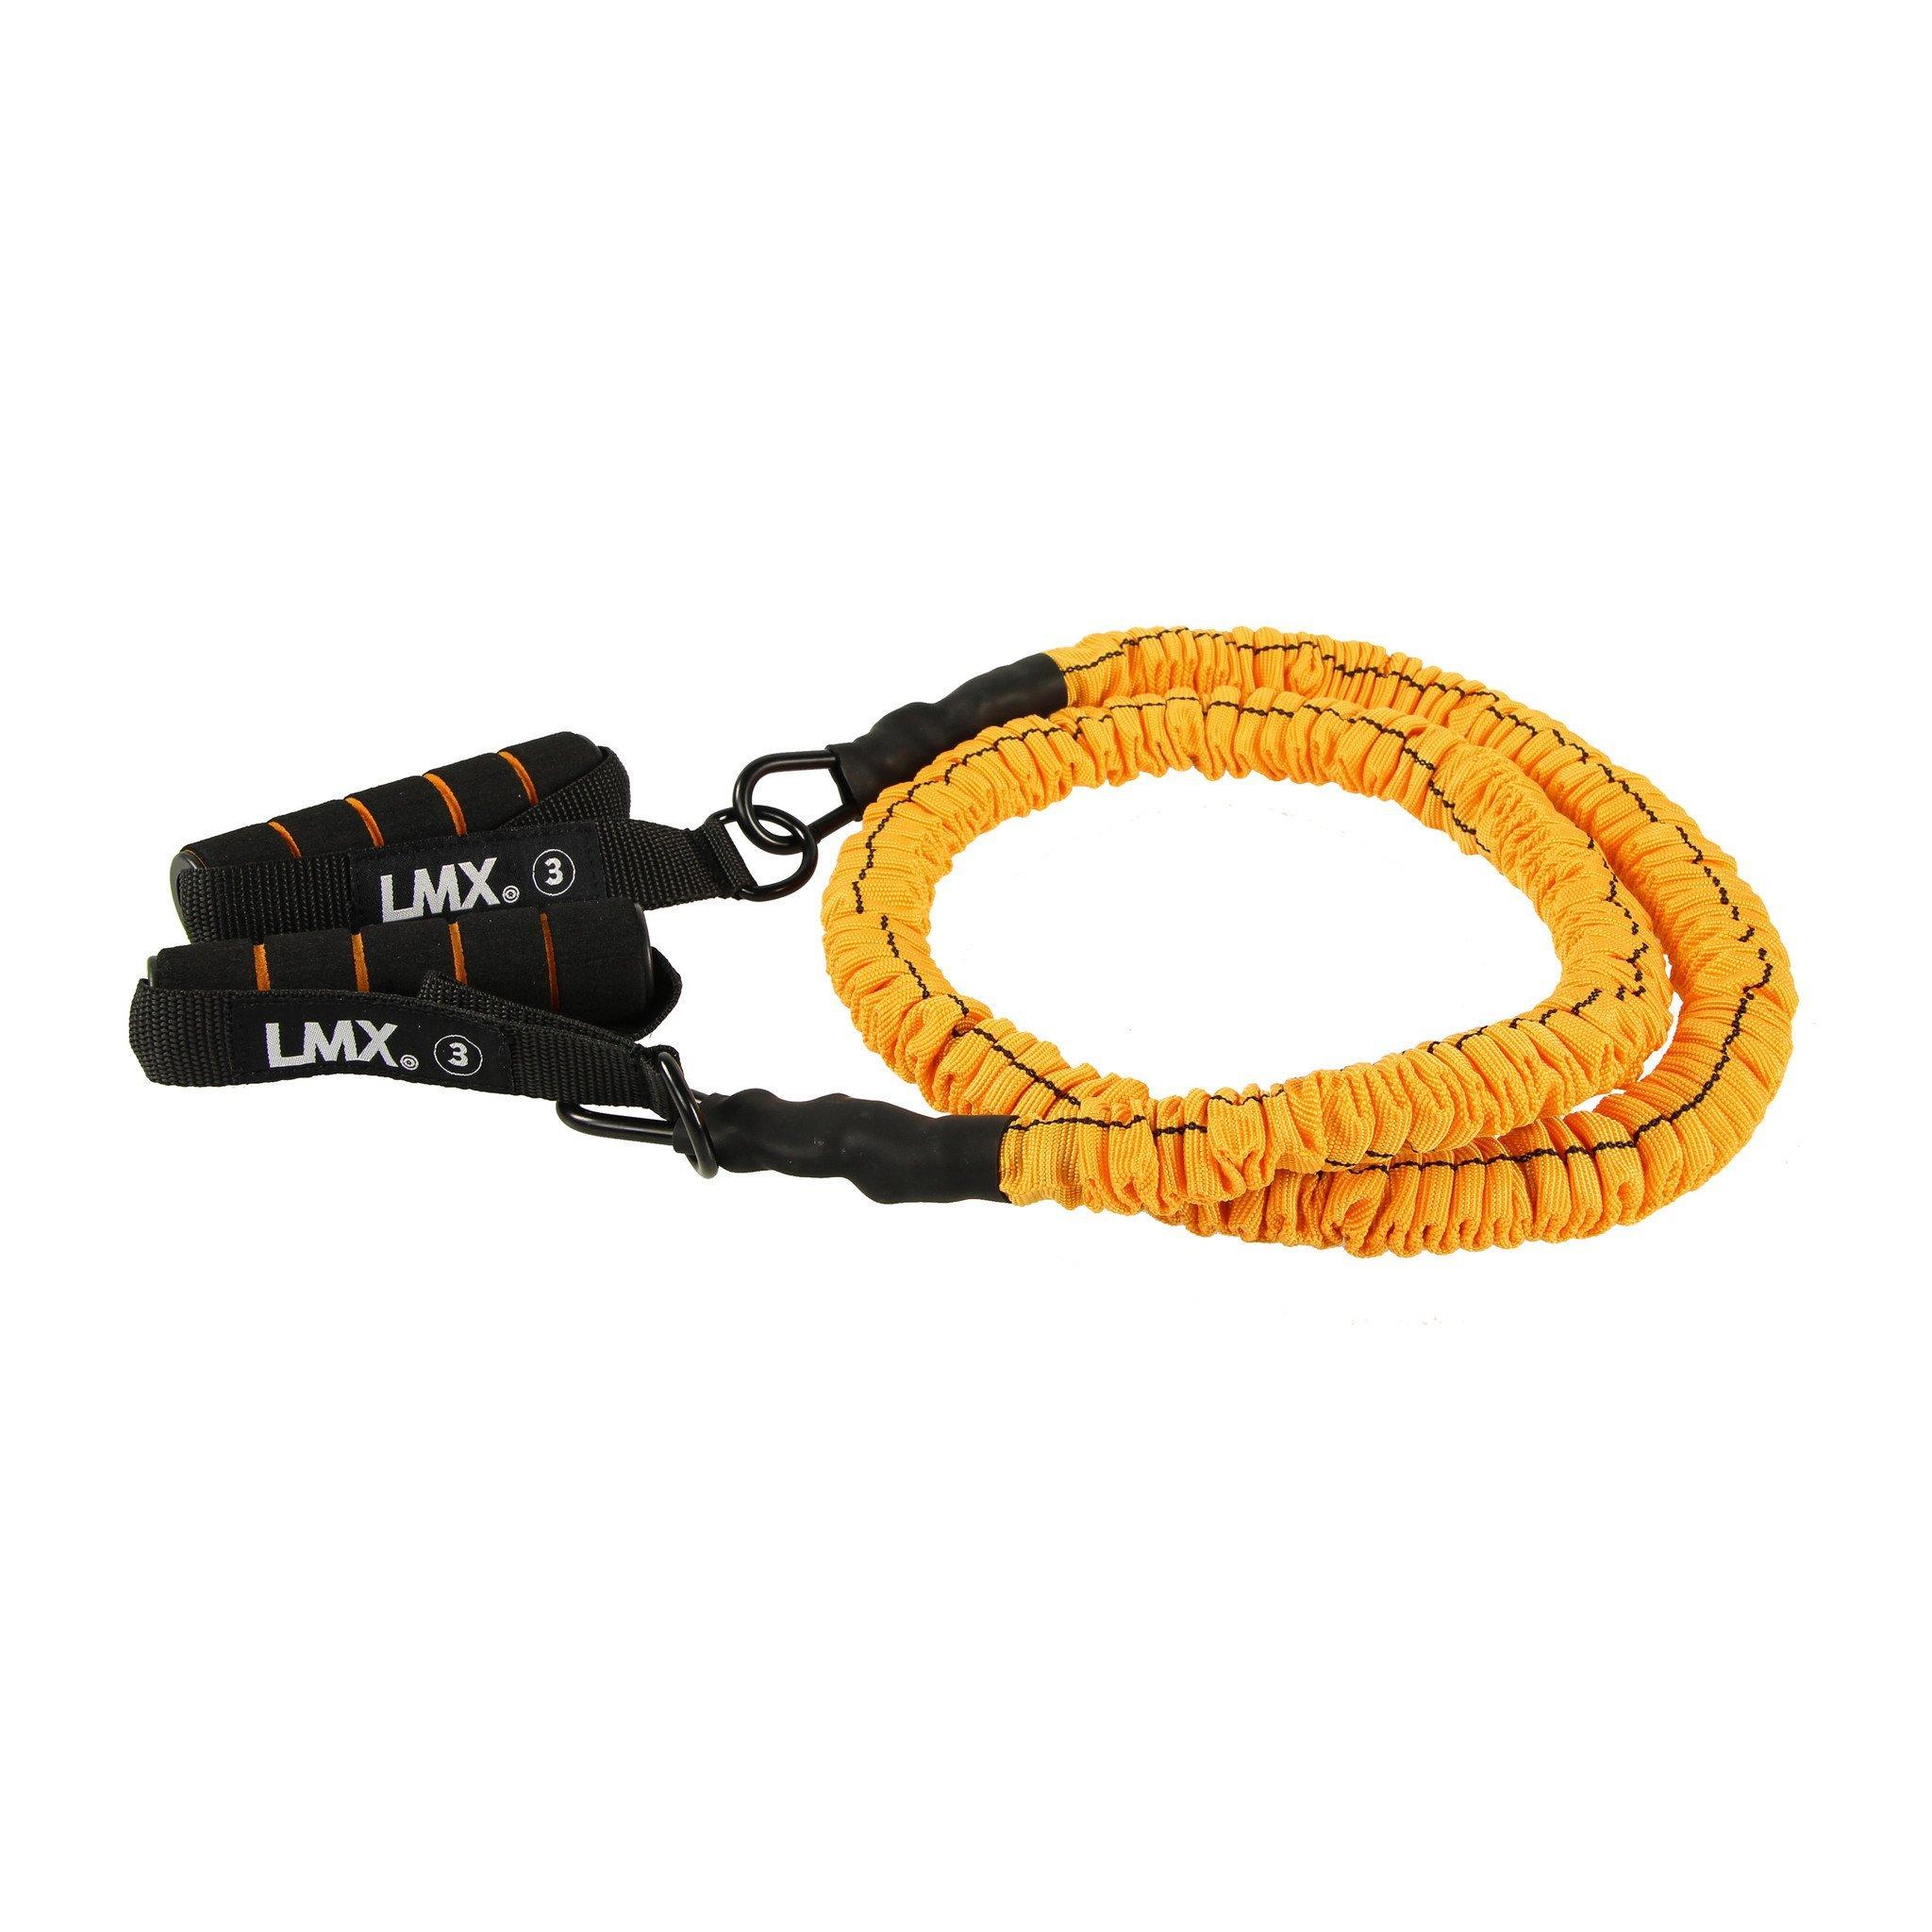 LMX. Power Tube Træningselastik Level 1 Yellow